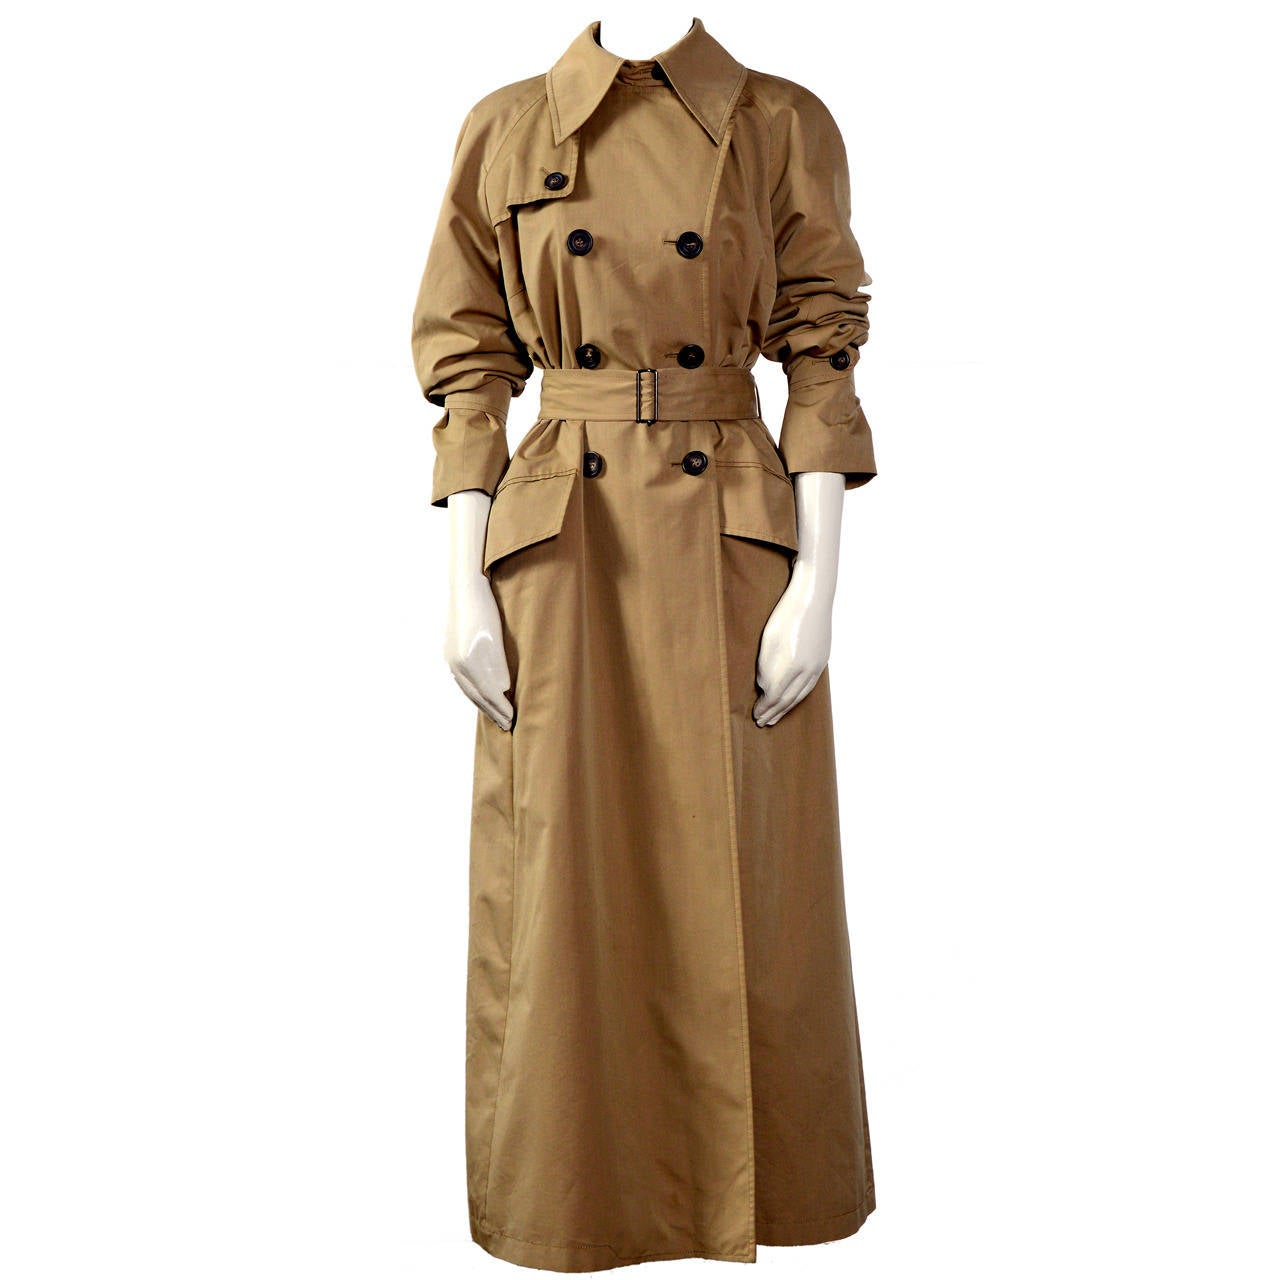 Vintage Dries Van Noten Mackintosh Raincoat at 1stdibs